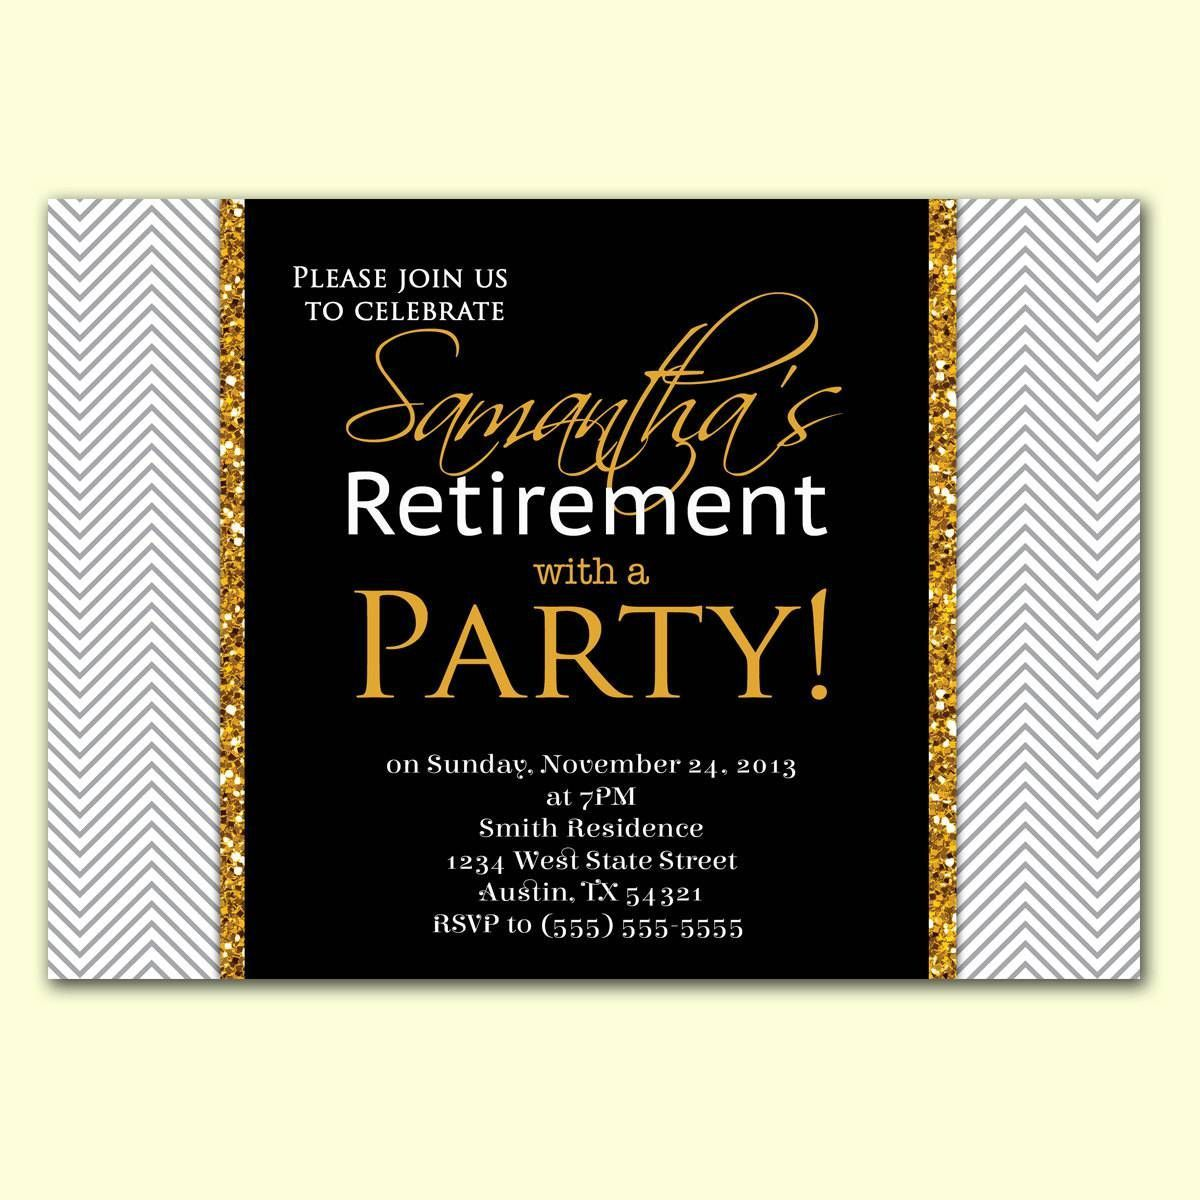 004 Unusual Retirement Party Invite Template Concept  Invitation Online M Word FreeFull